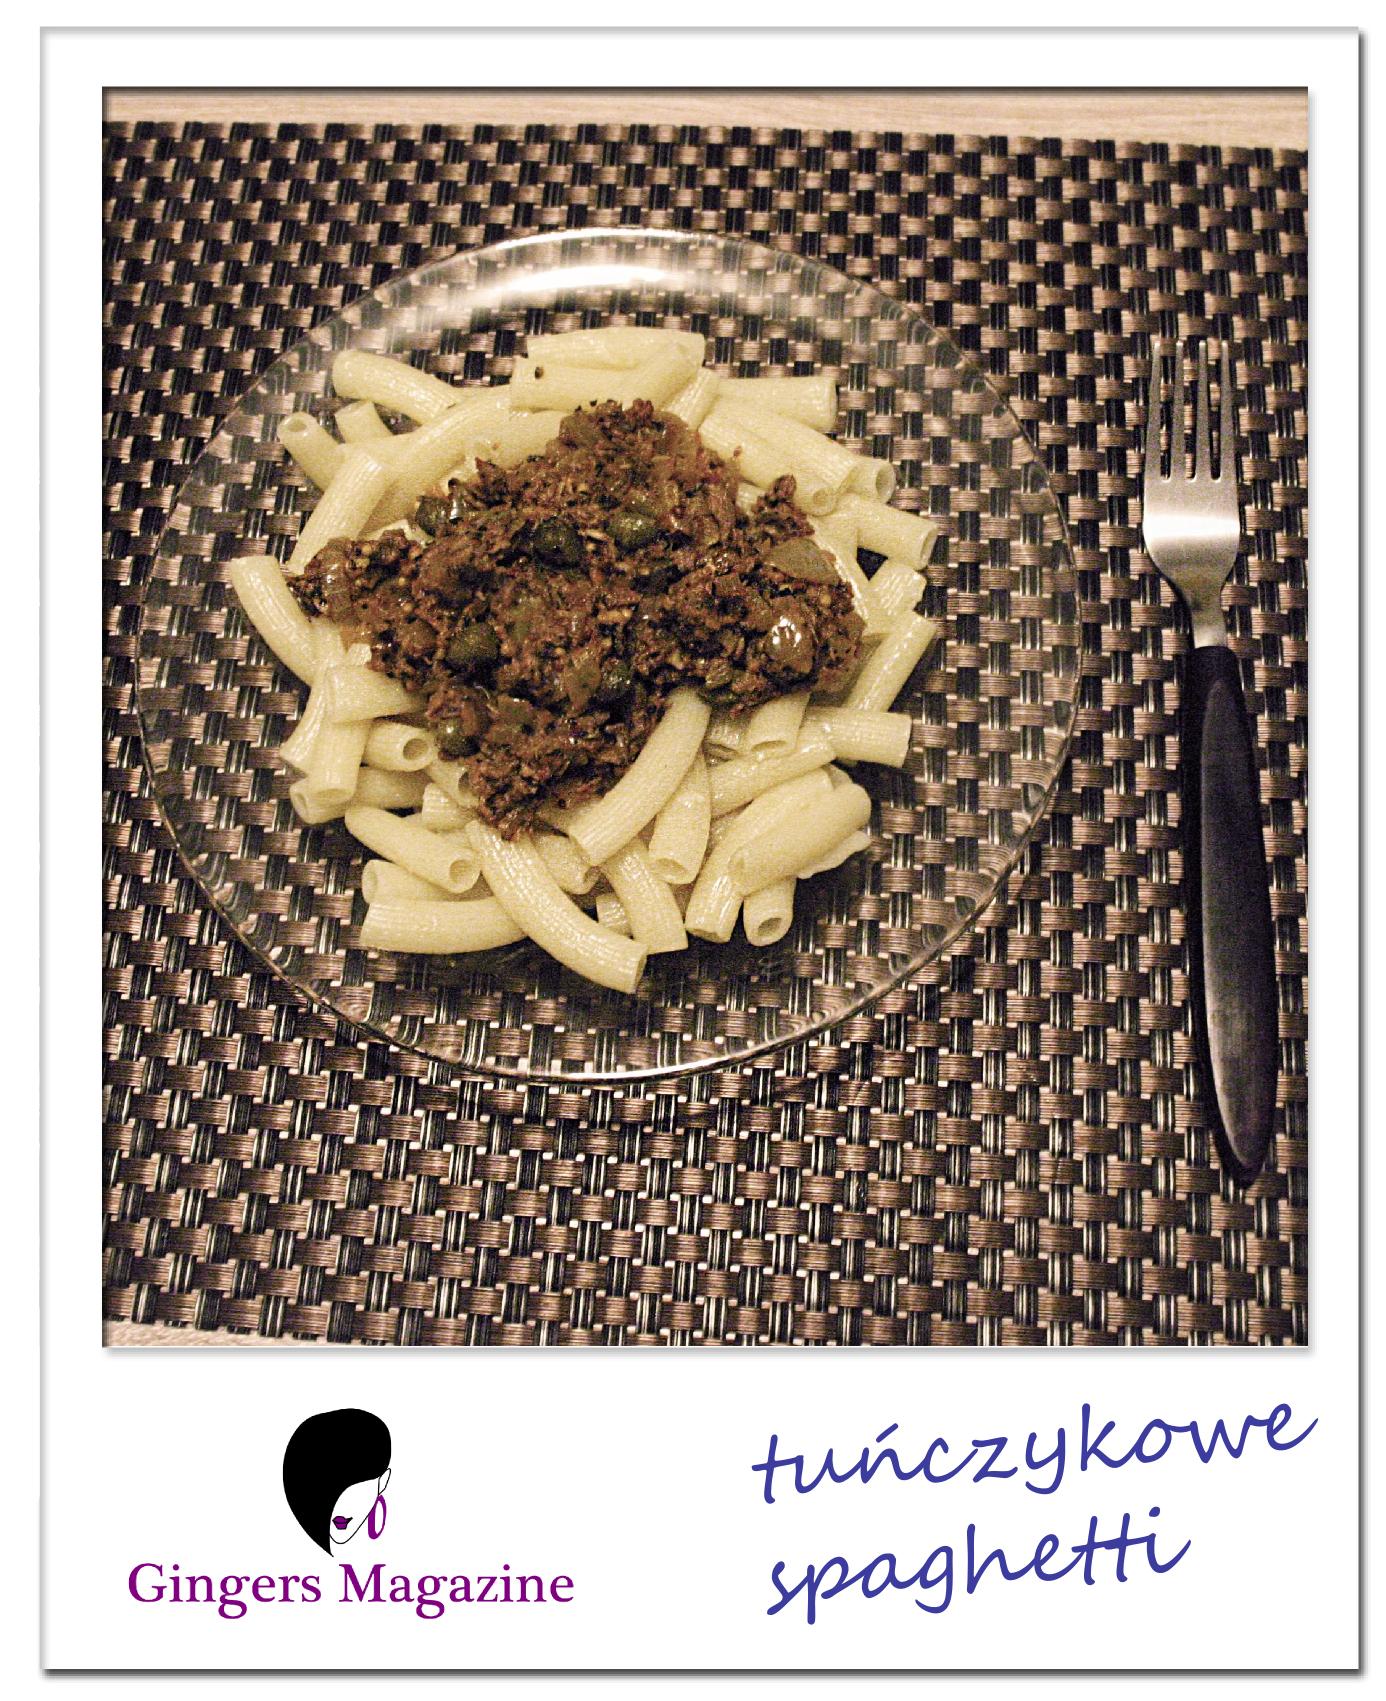 Tunczykowe spaghetti